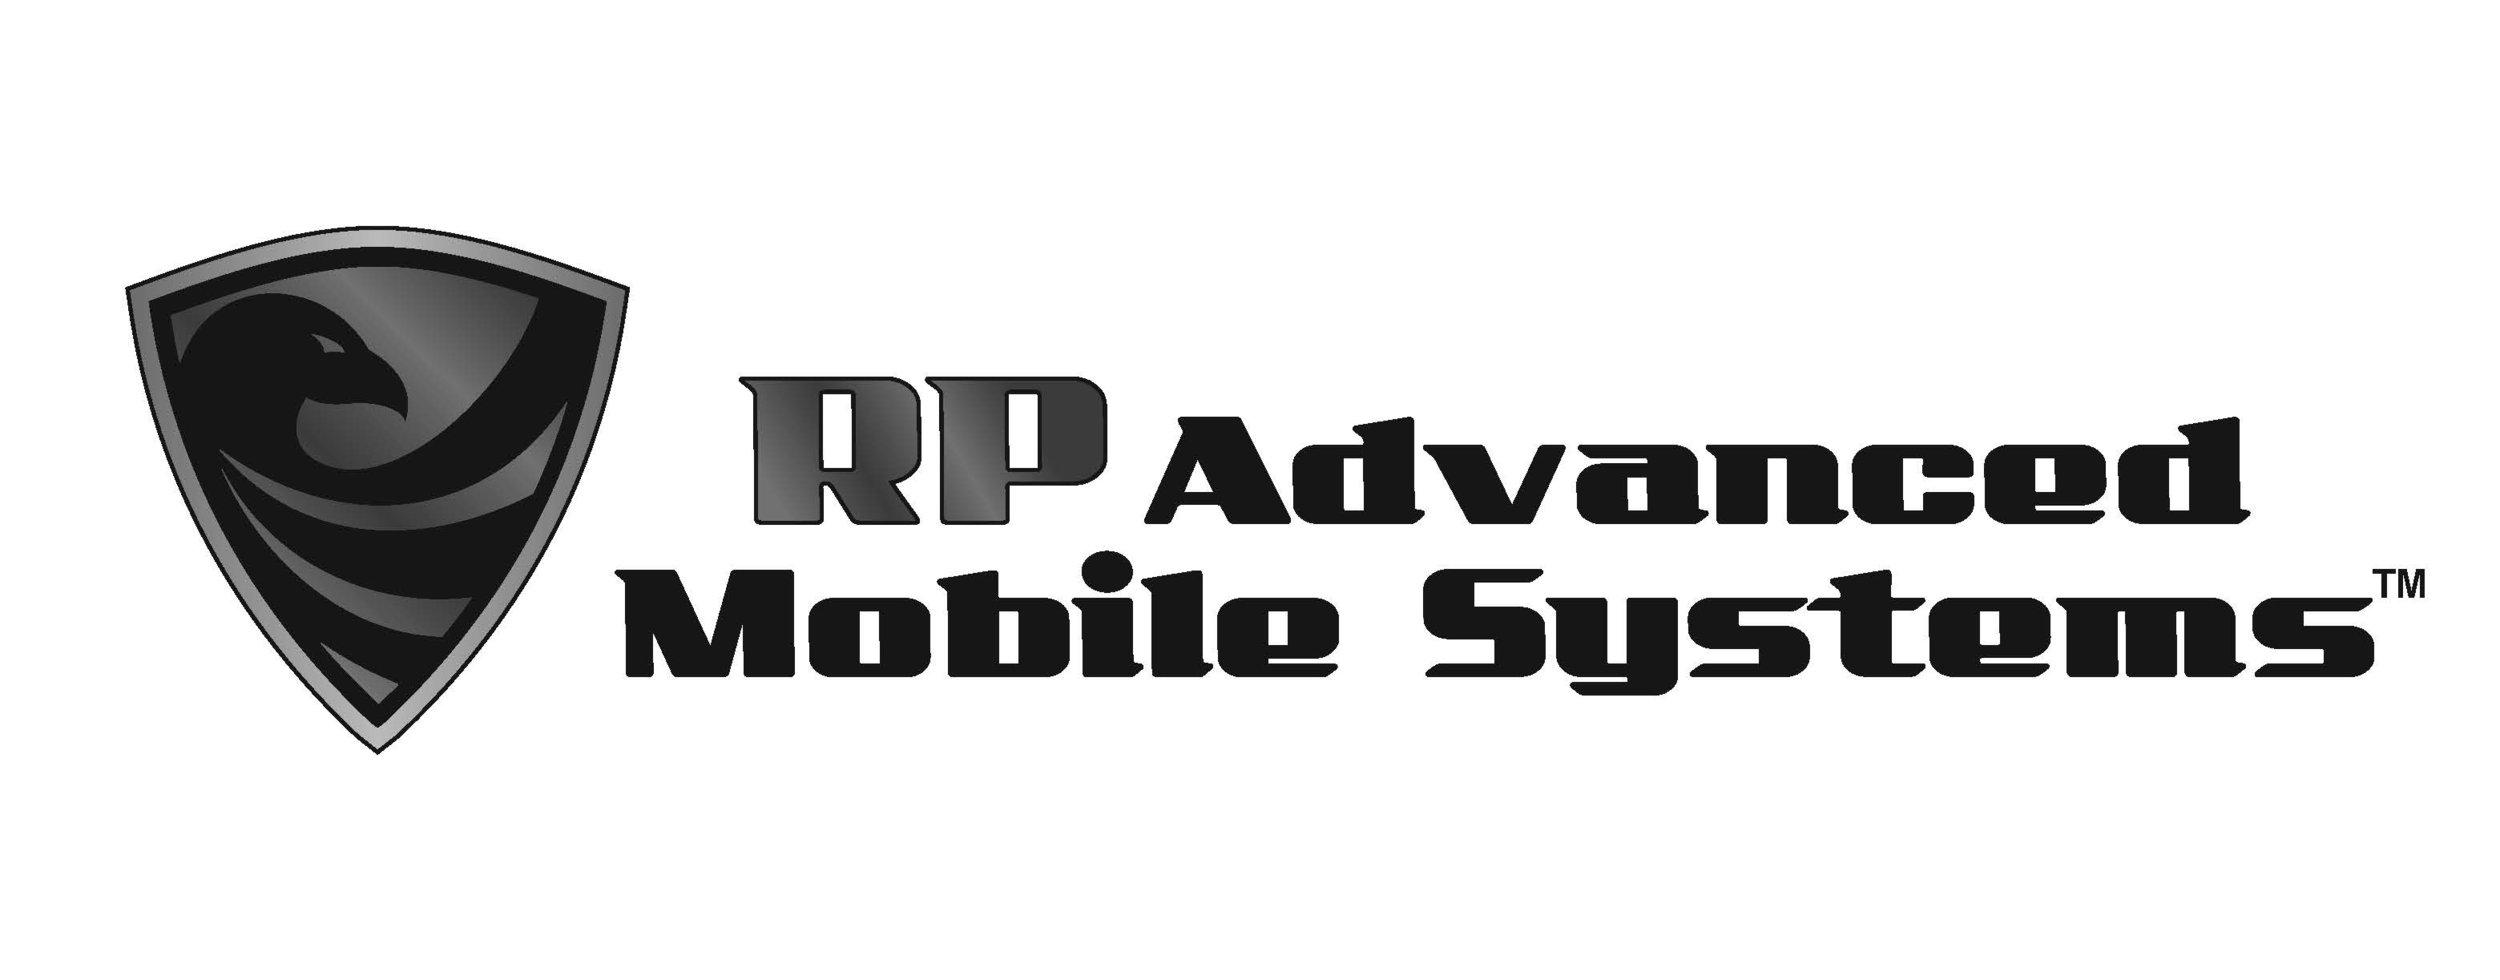 RP Advance Logo.jpg